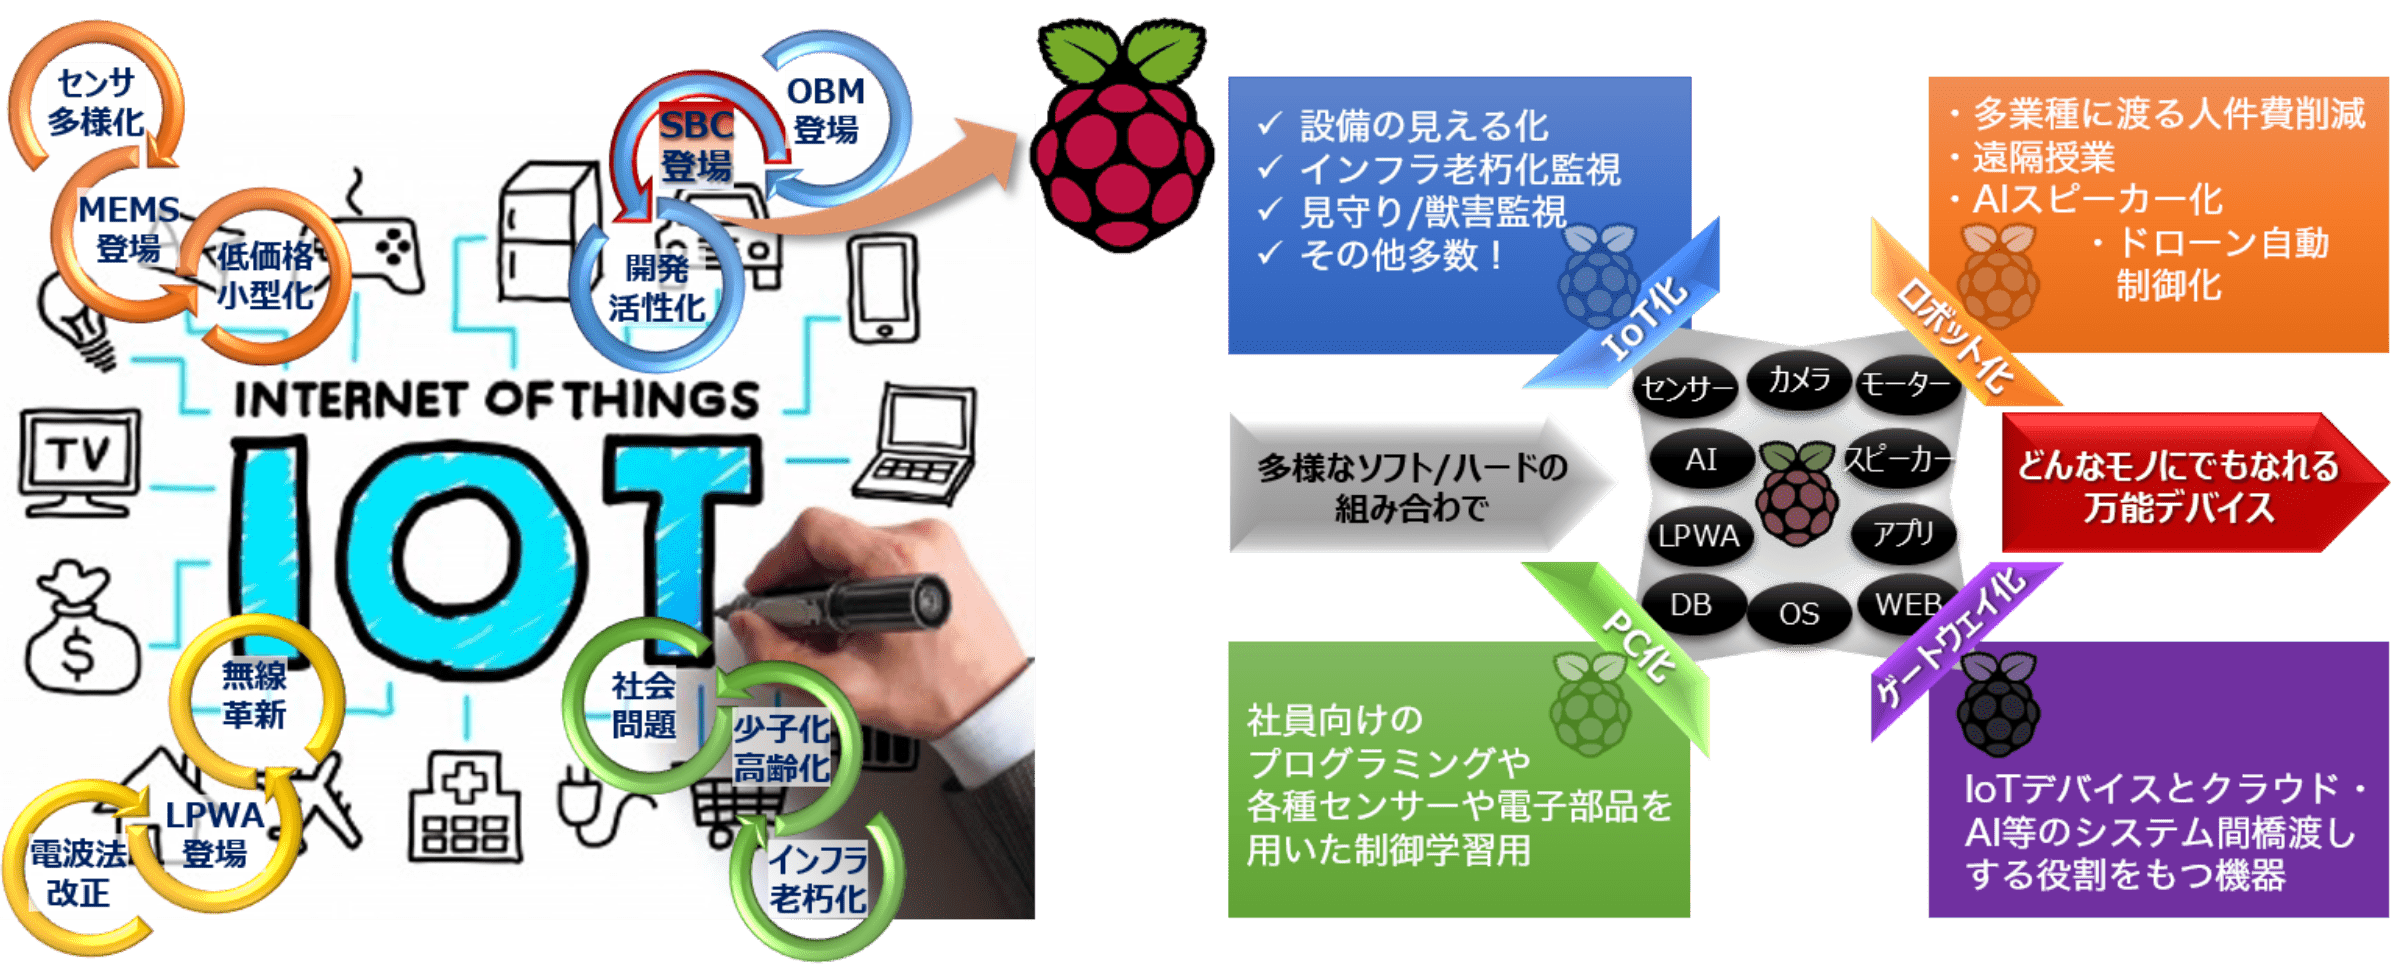 IoTにおけるRaspberry Piの位置付け